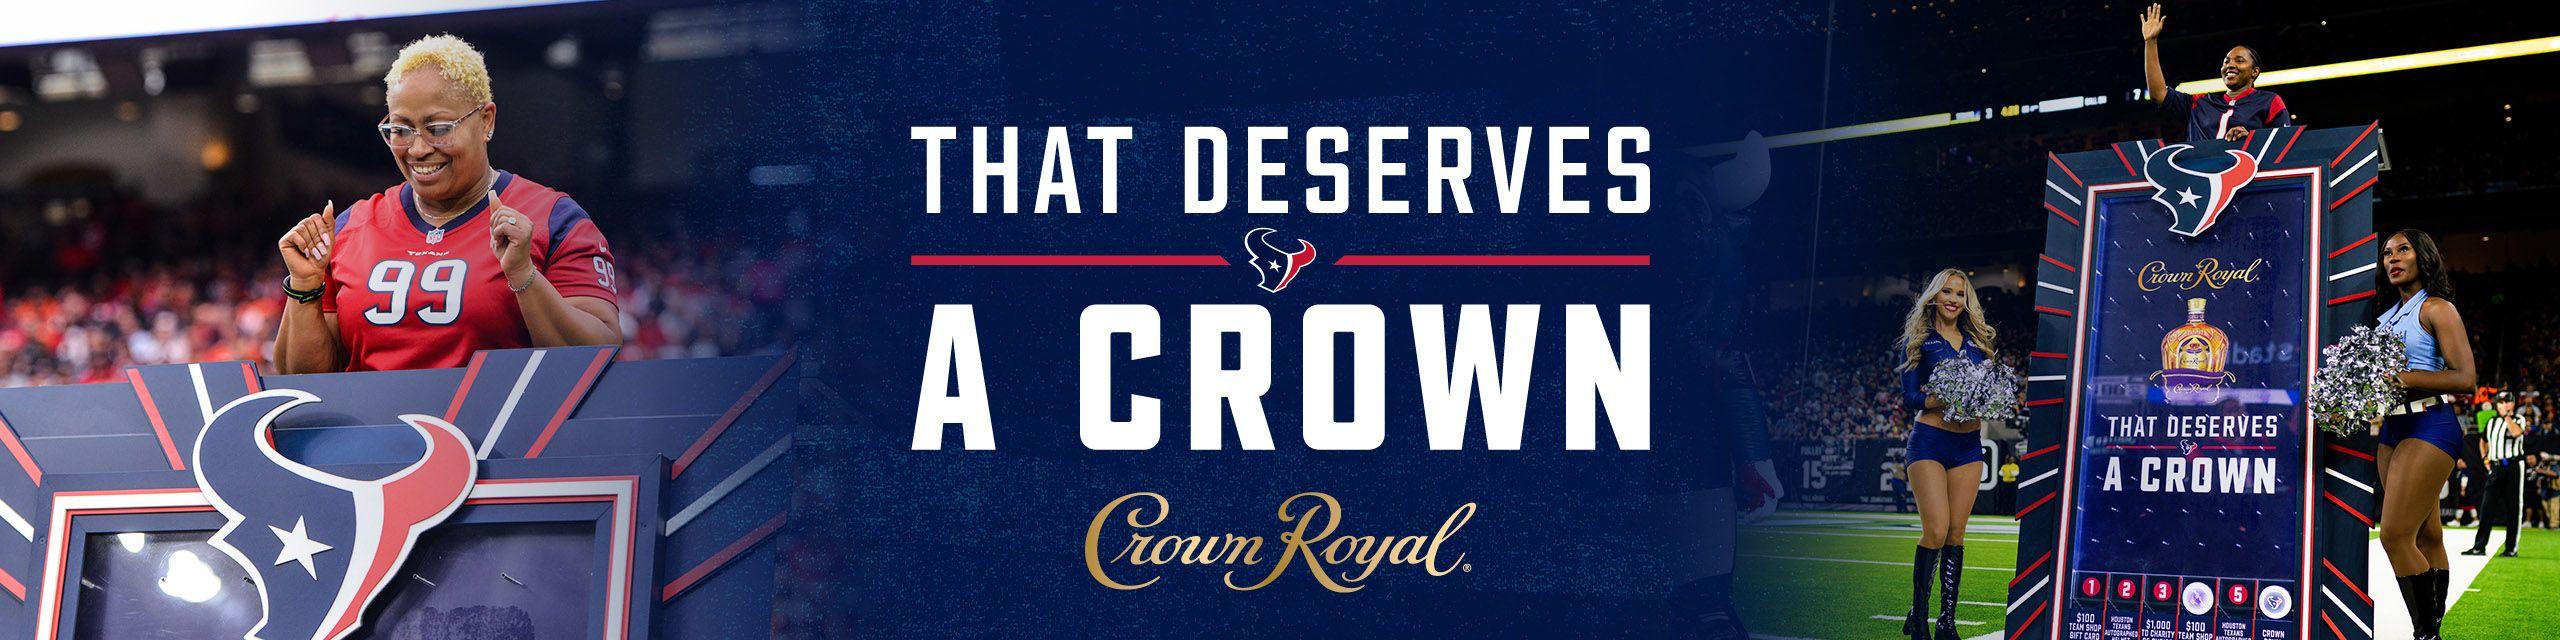 Deserves a Crown_Hero